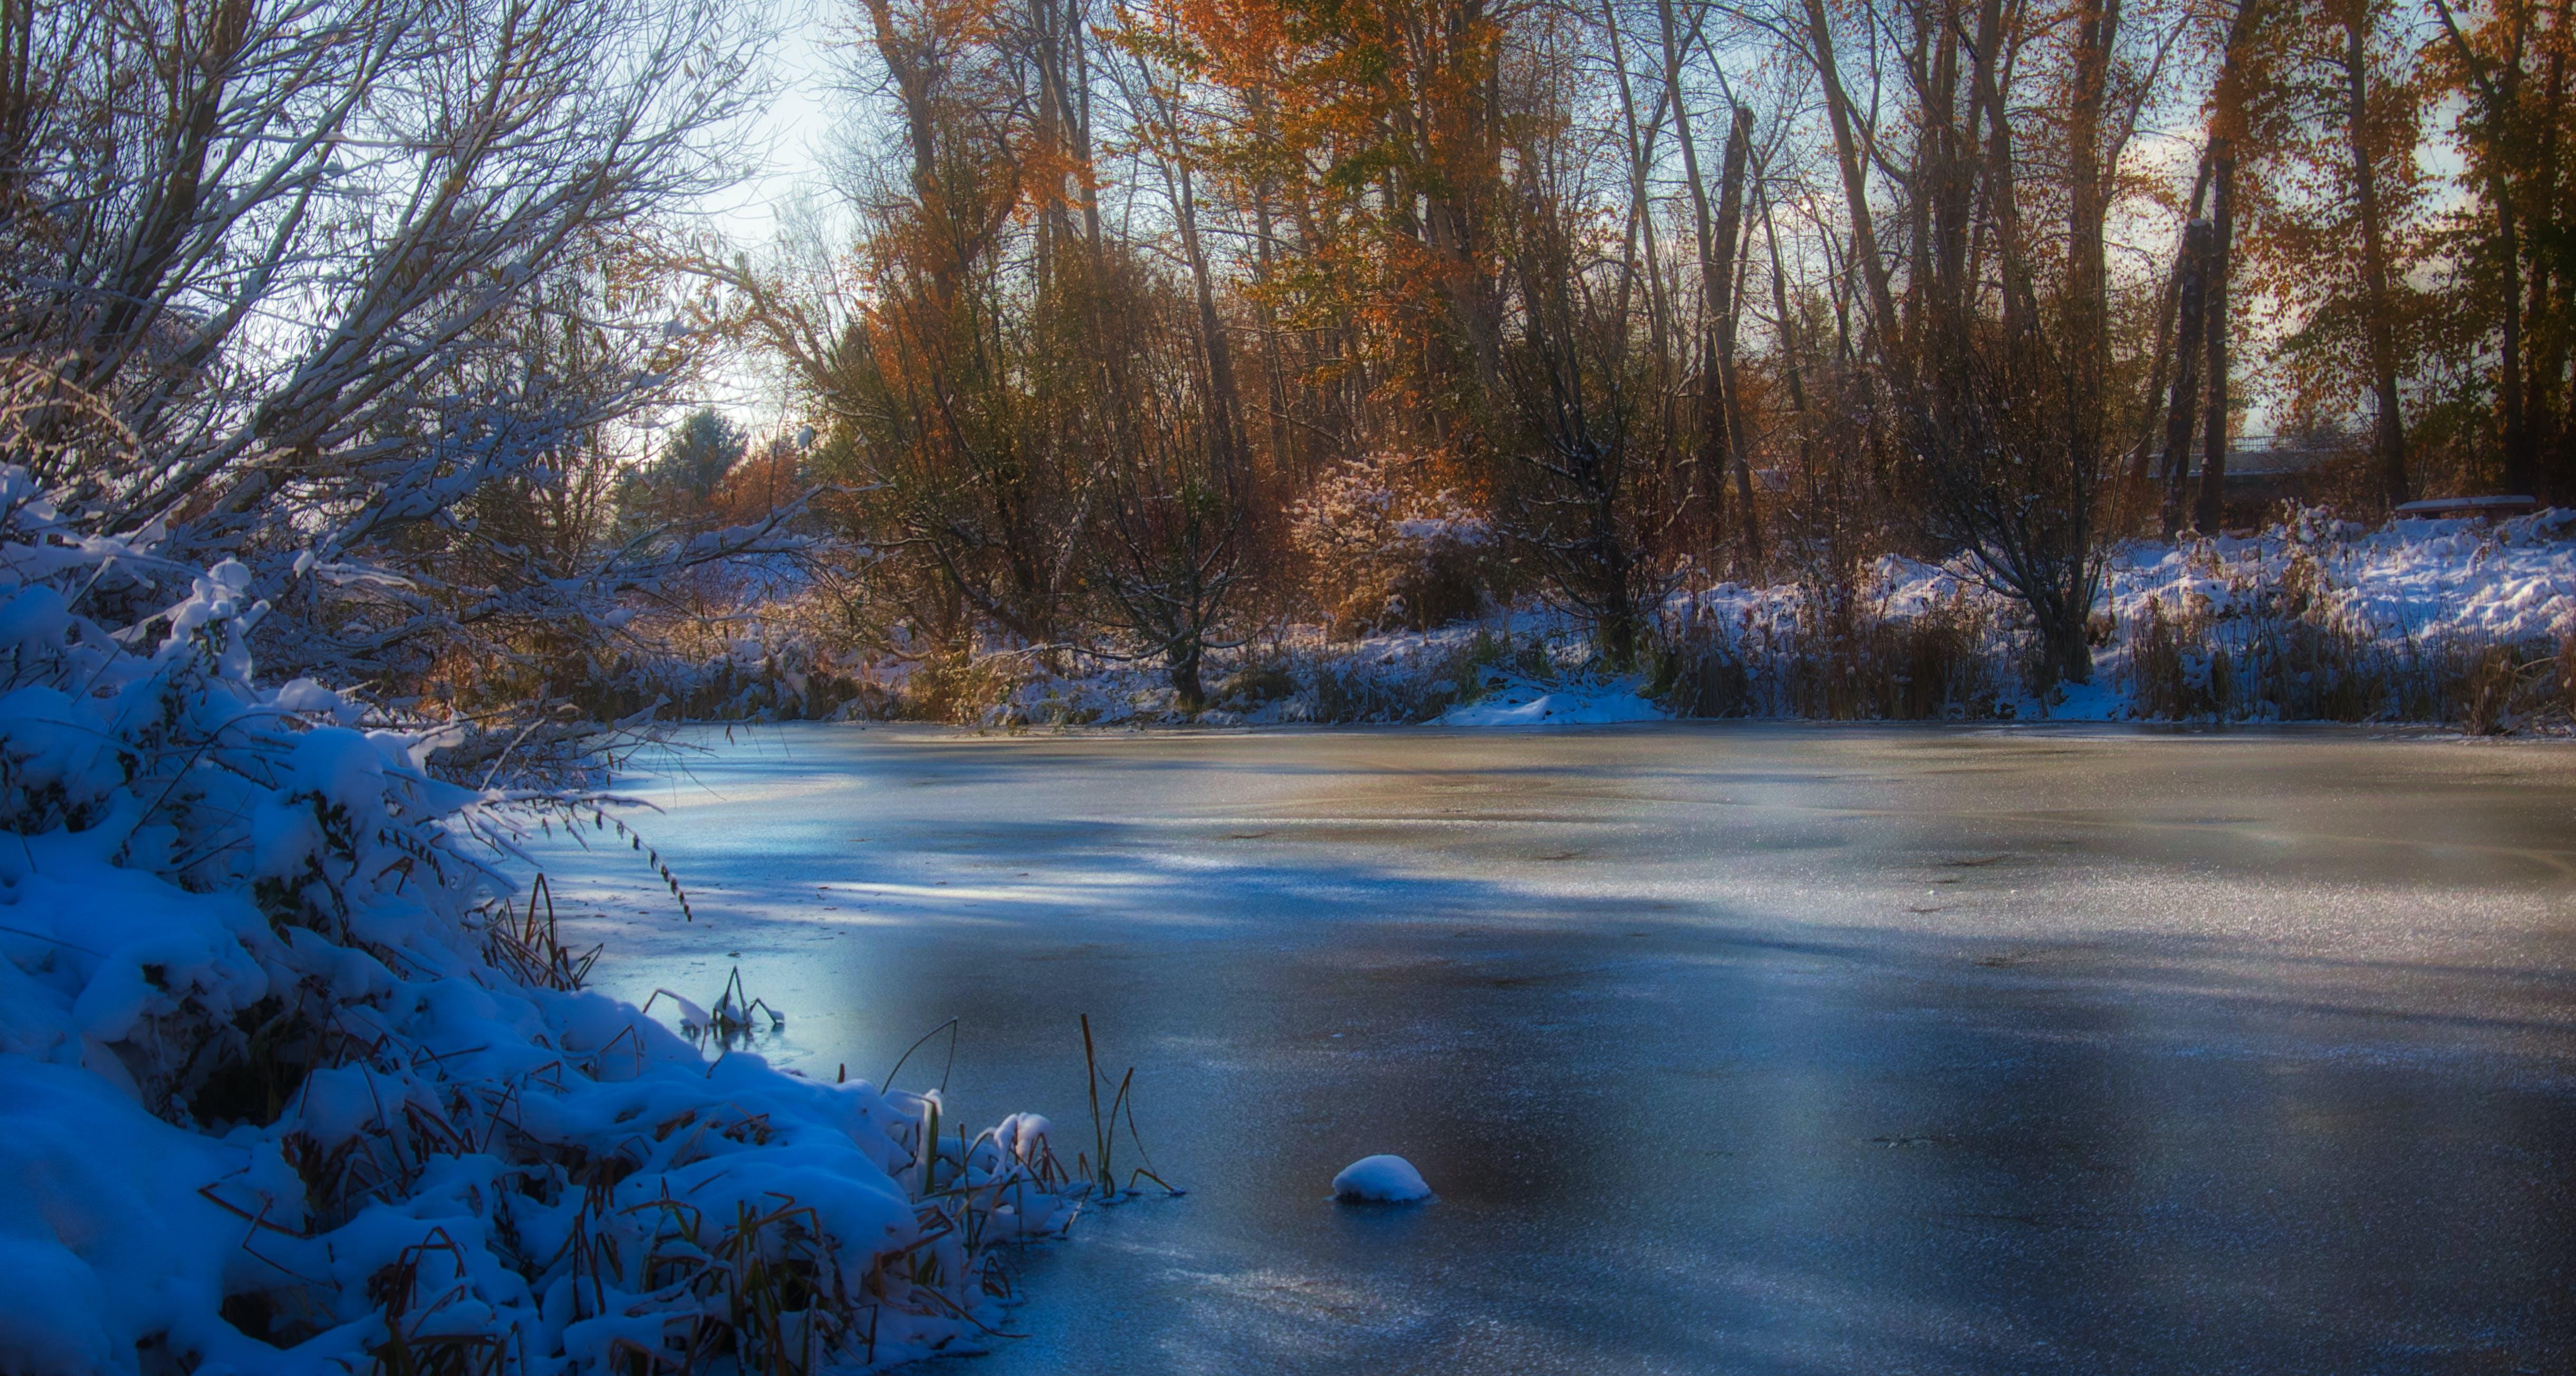 Free stock photo of winter fall ice water creek river